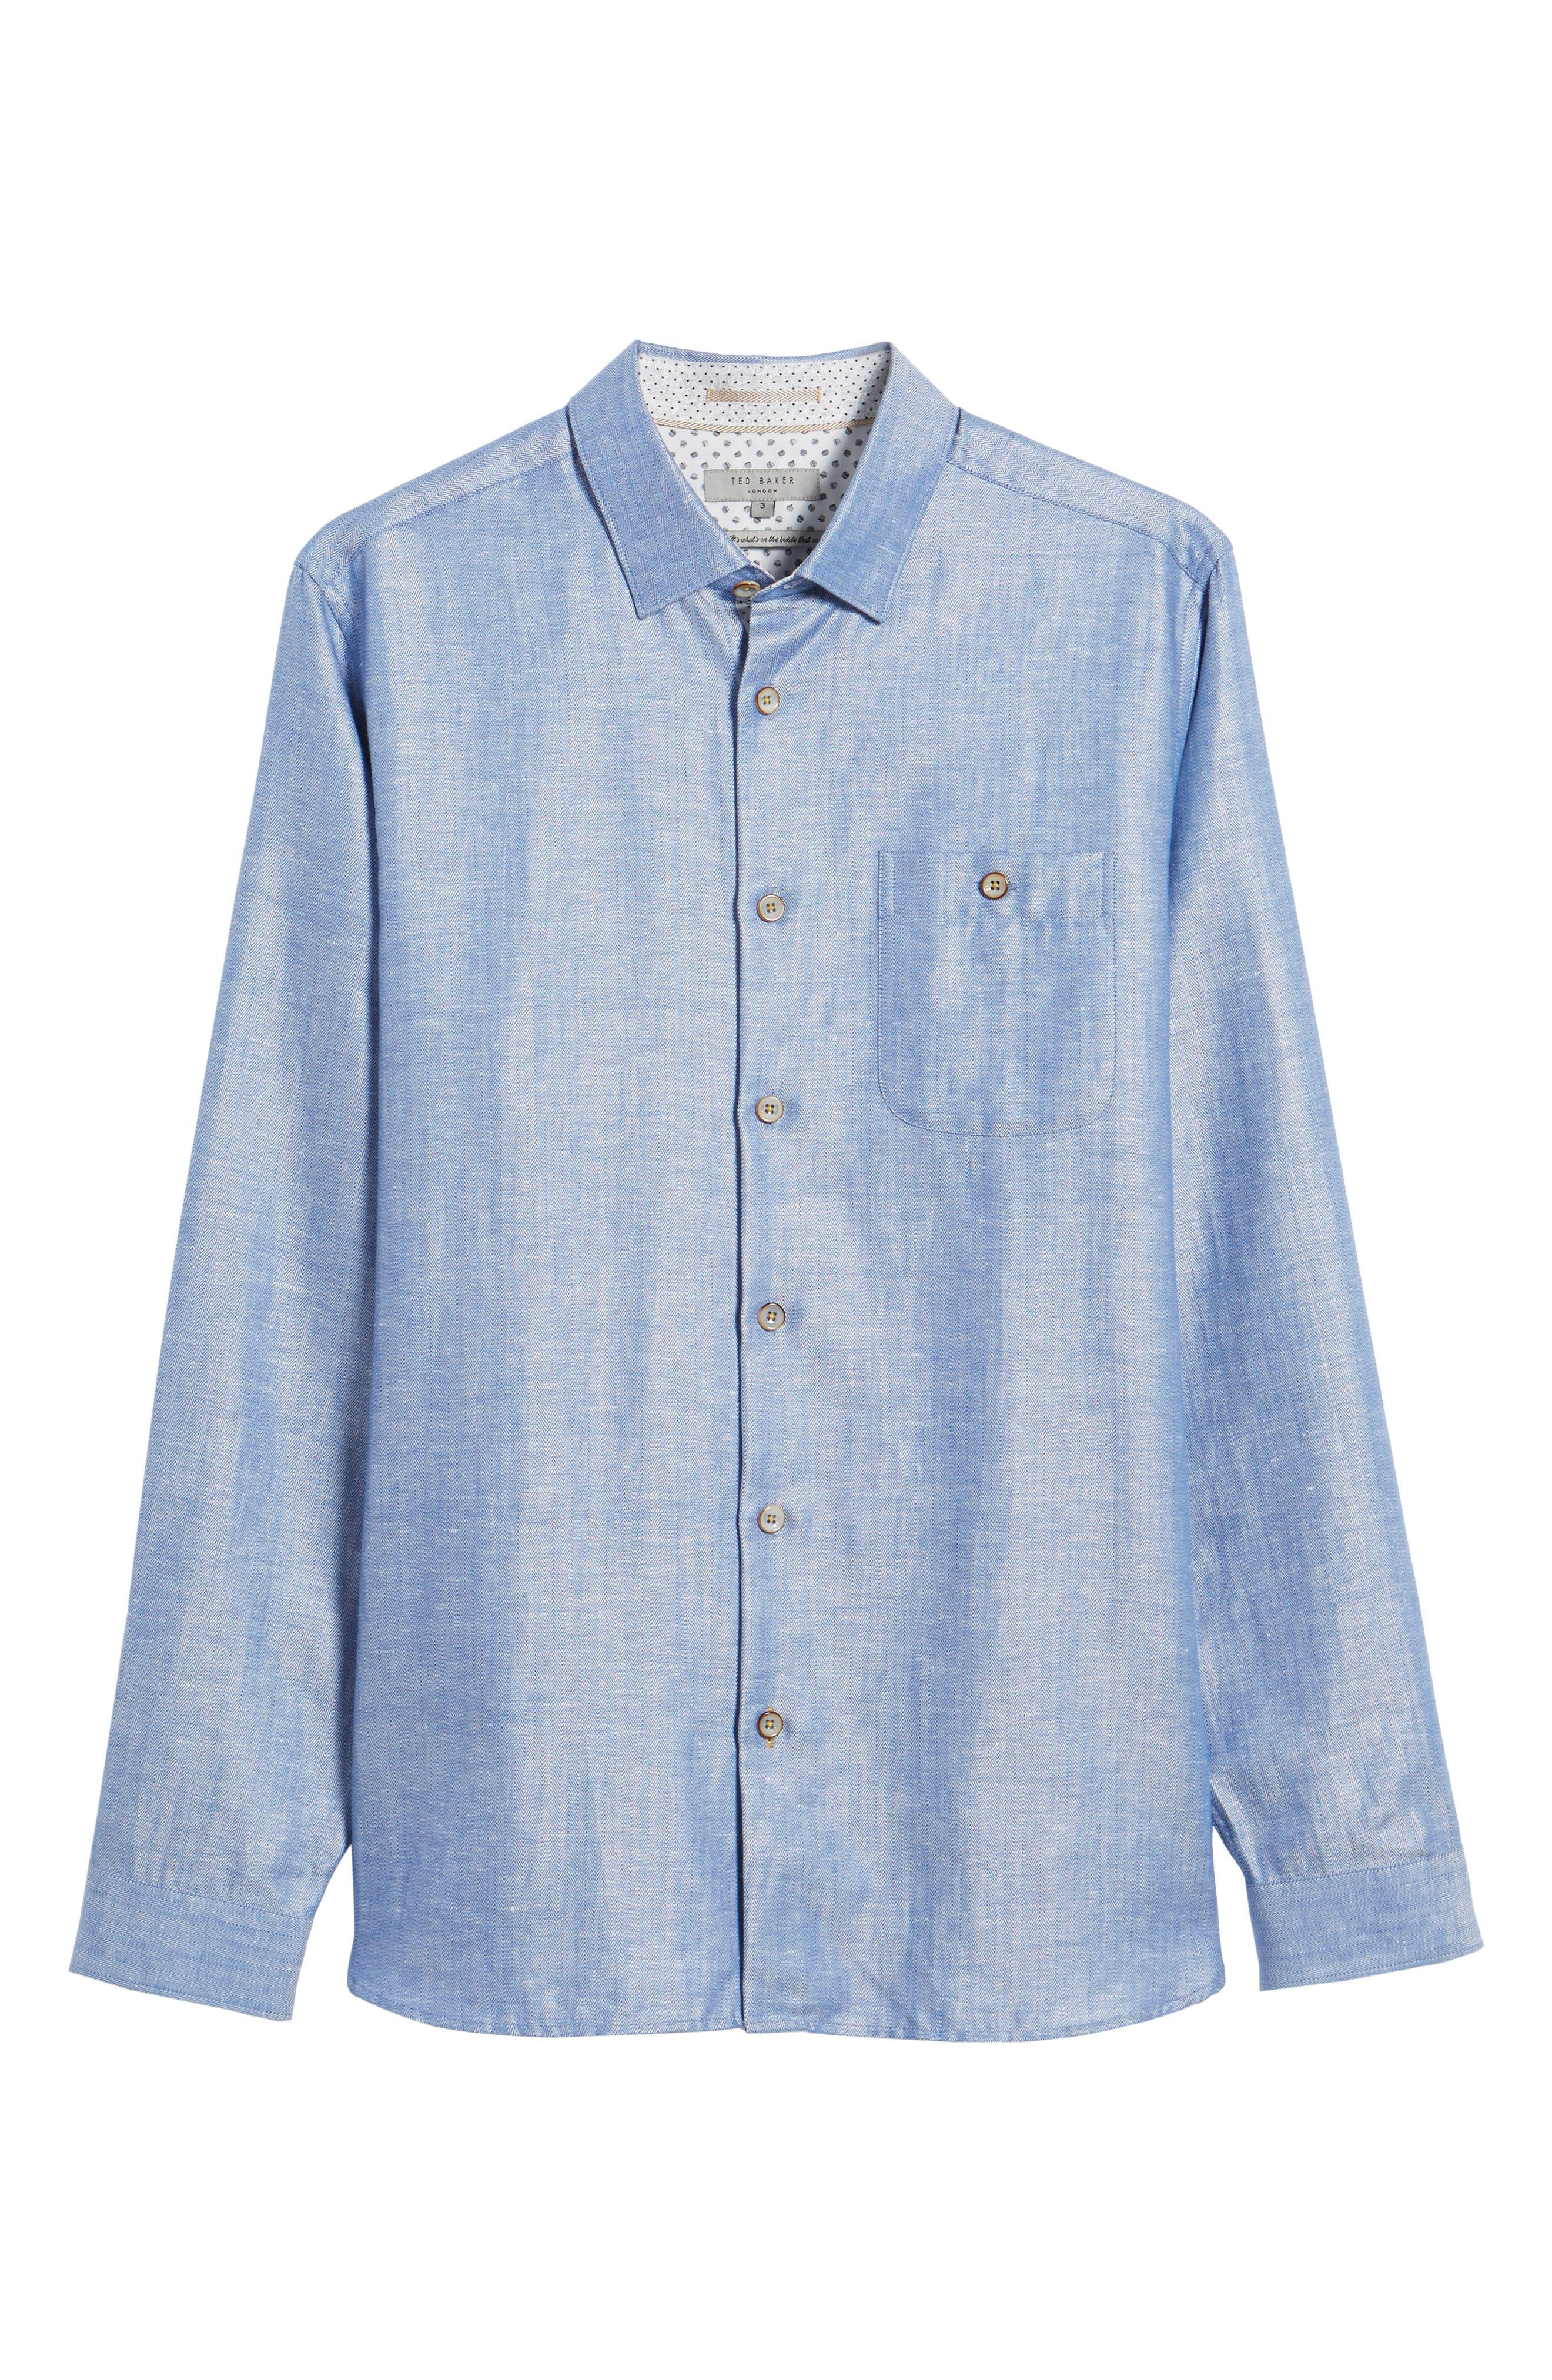 Linlins Herringbone Cotton & Linen Sport Shirt,                             Alternate thumbnail 27, color,